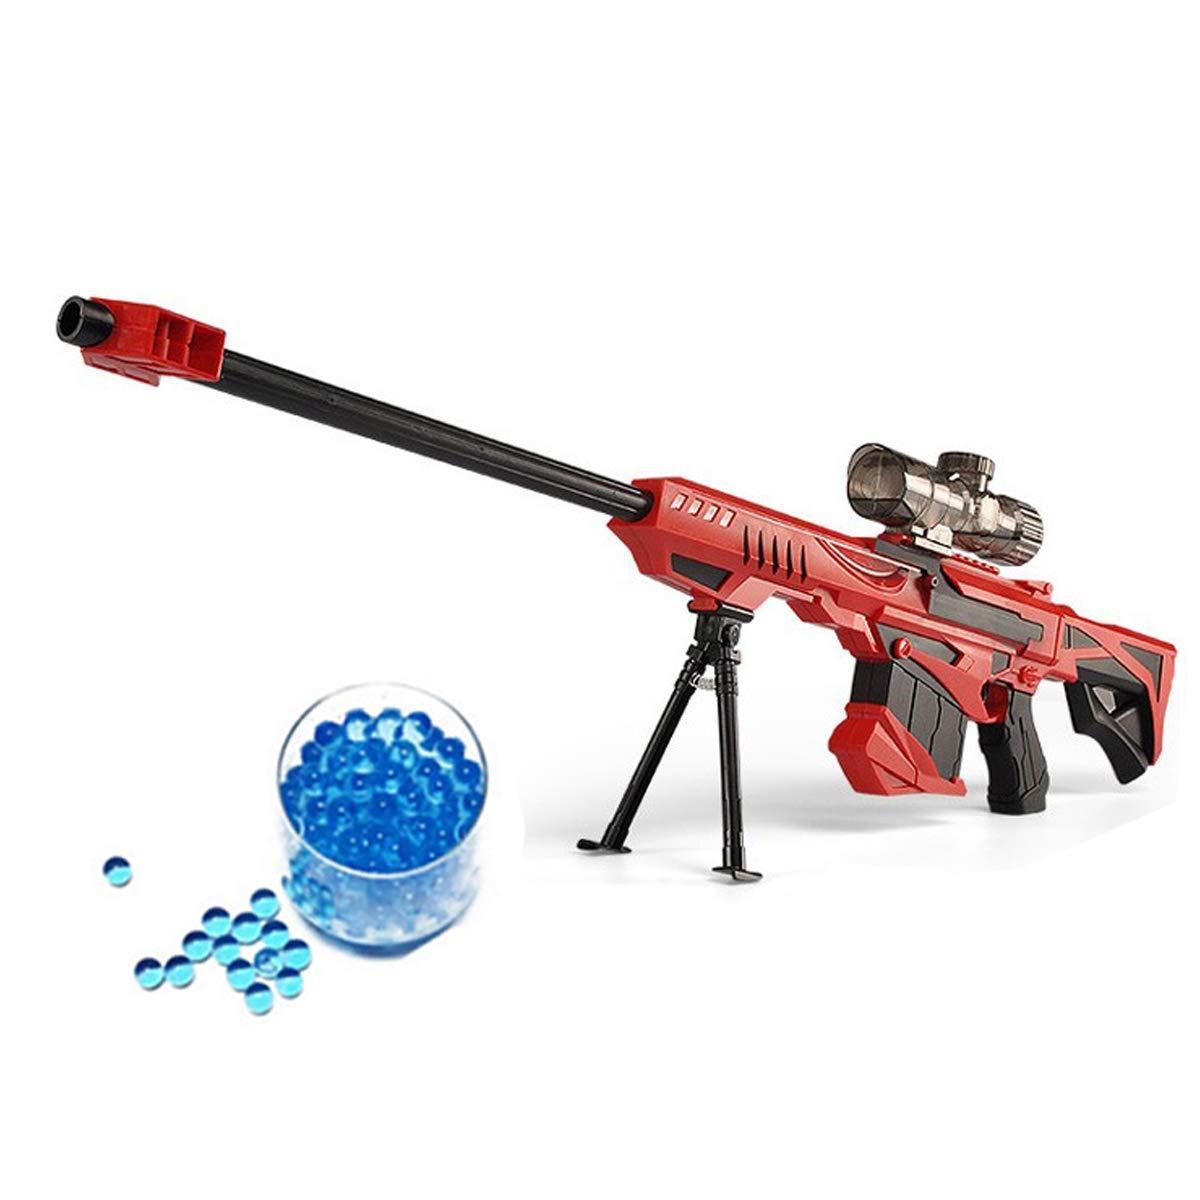 JINFYUAN Water Bomb Toy Gun, Military Combat Barrett Sniper rifle, i bambini all' aperto CS Water Bomb giocattolo fucile di precisione + 15000Crystal Bullet, Red JINGYUAN